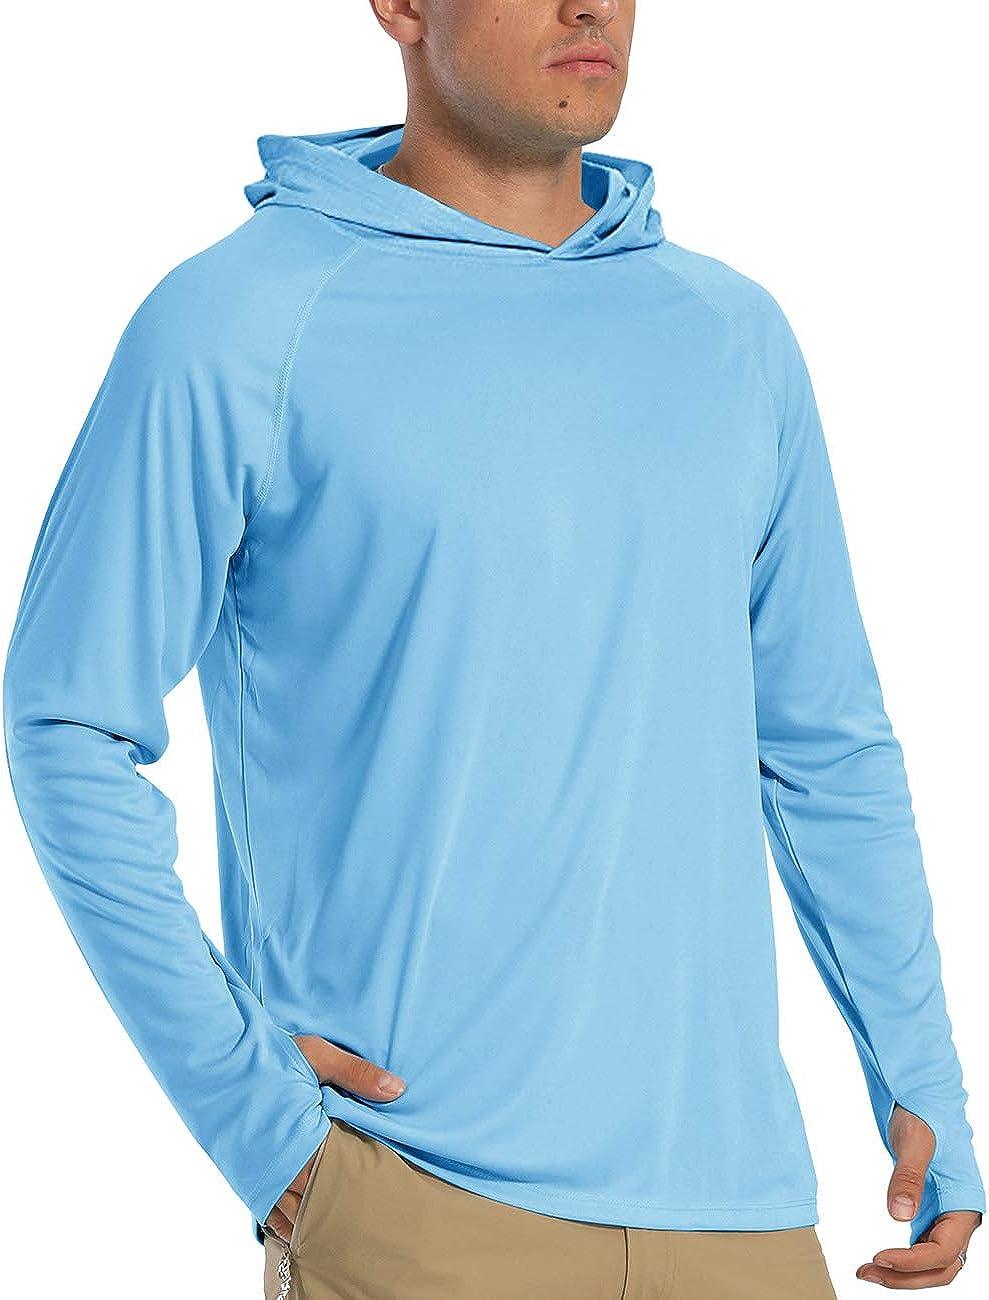 Mens Sun Protection Shirt Long Sleeve with Hoodie UPF 50 Rashguard Outdoor Fishing Shirts